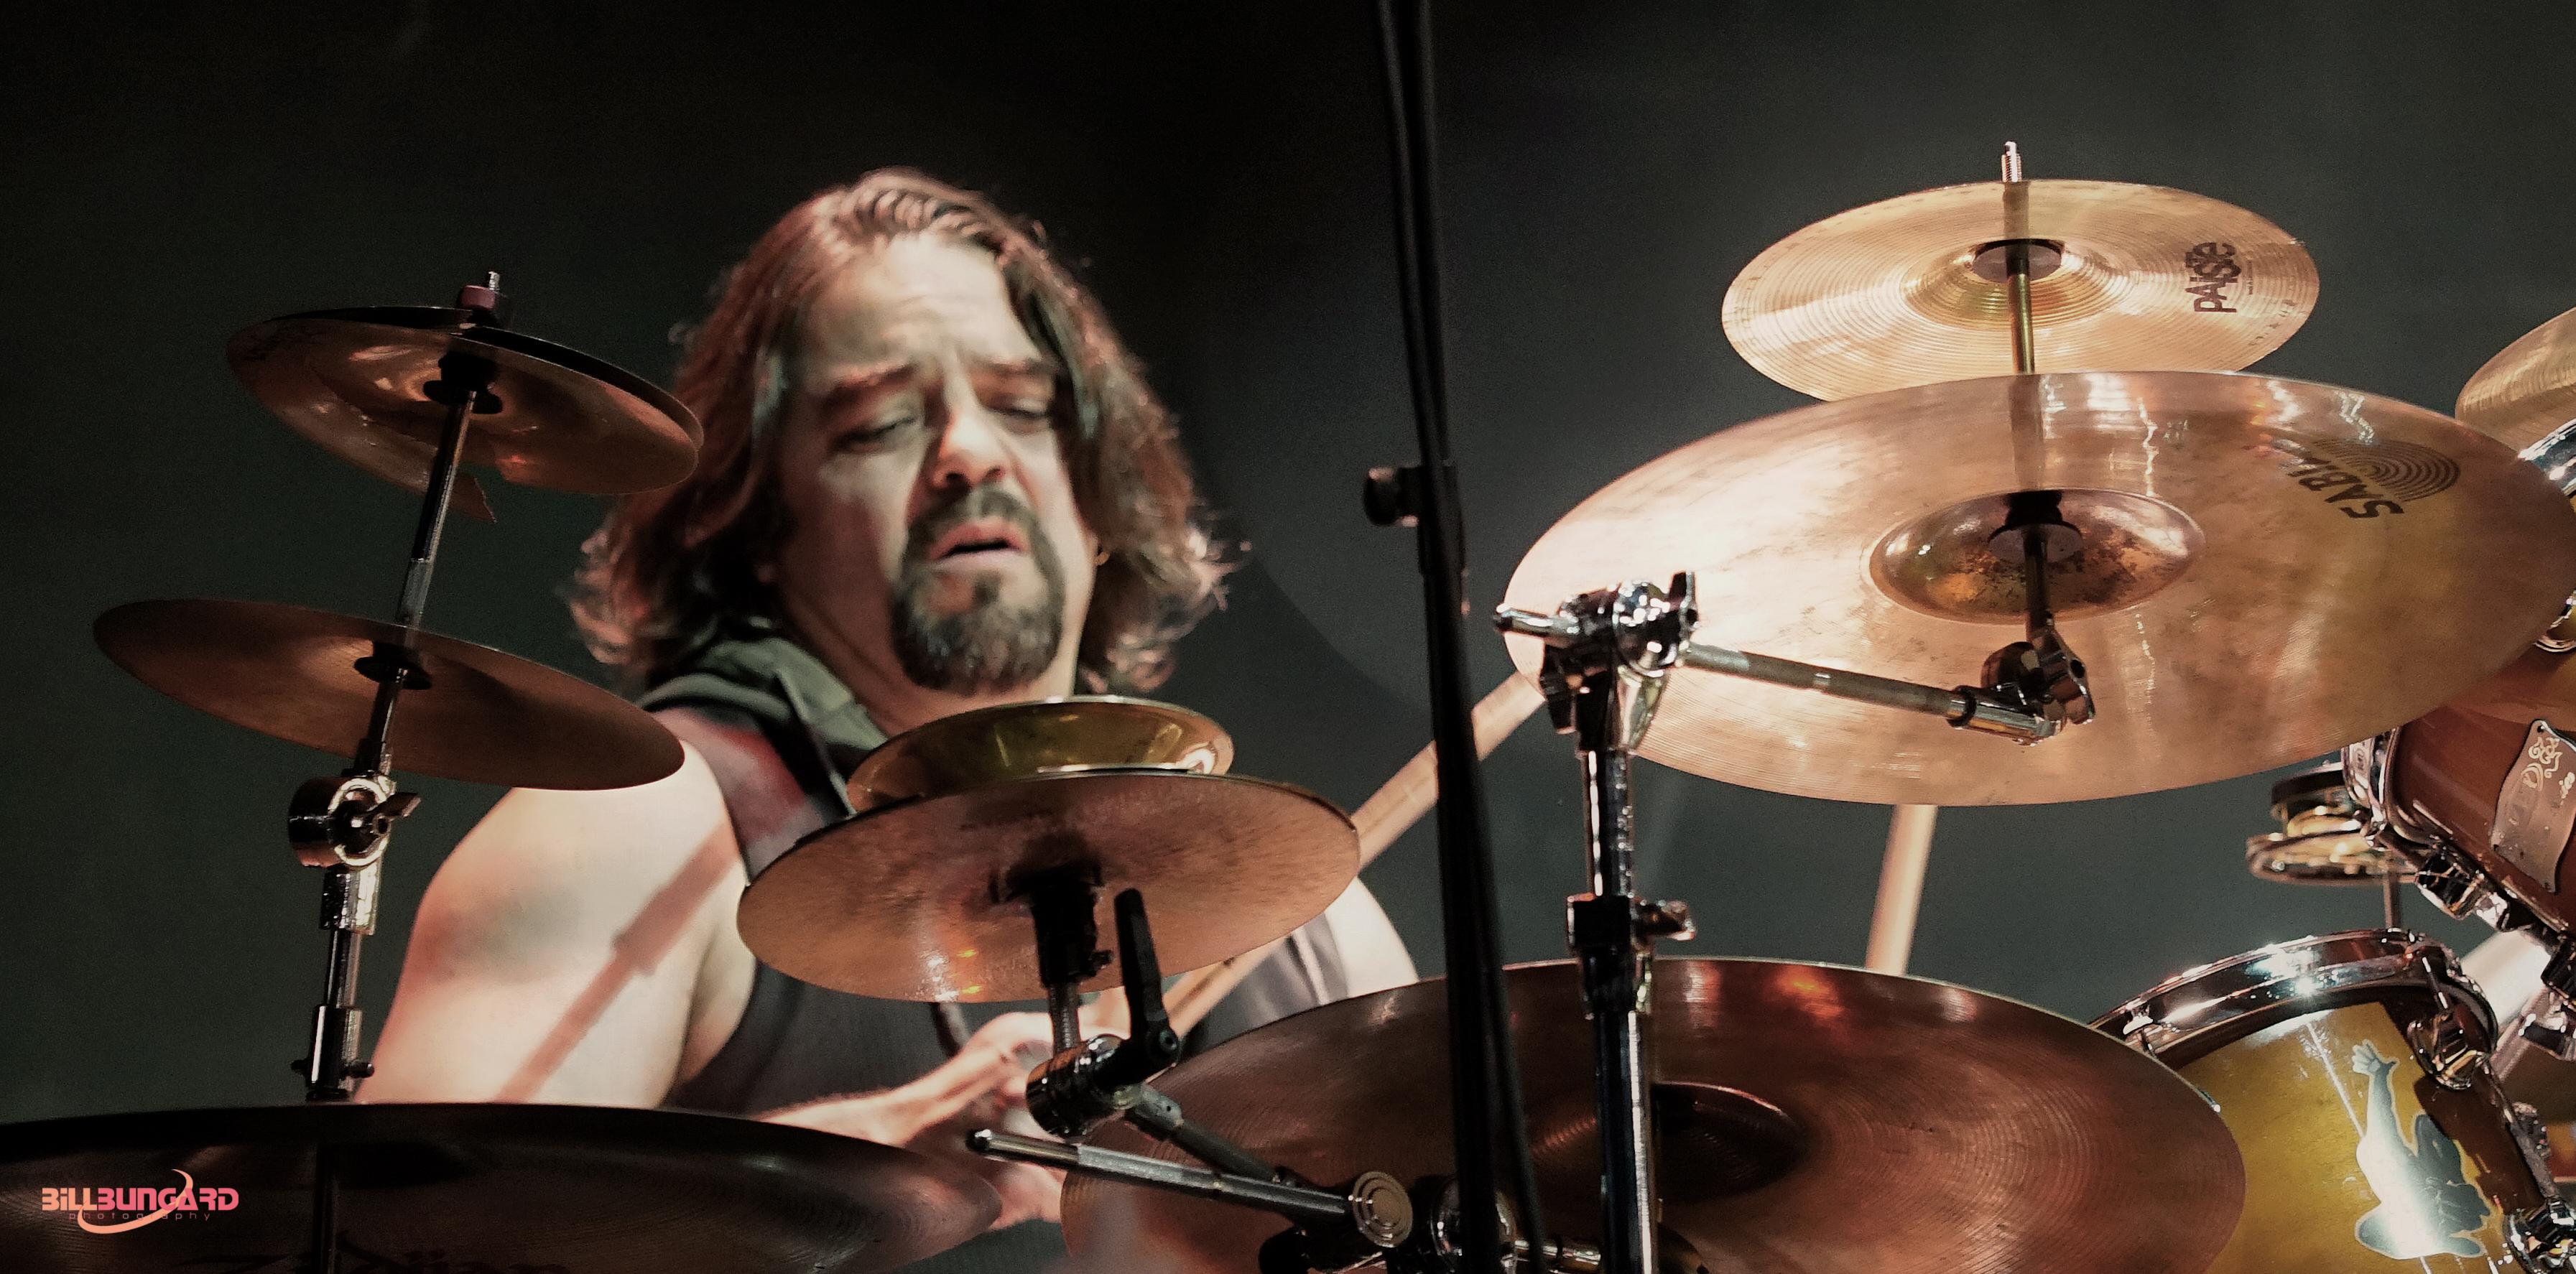 Eddie Mendoza of Aury Moor Band at Woodstick 2015 (Photo by Bill Bungard)